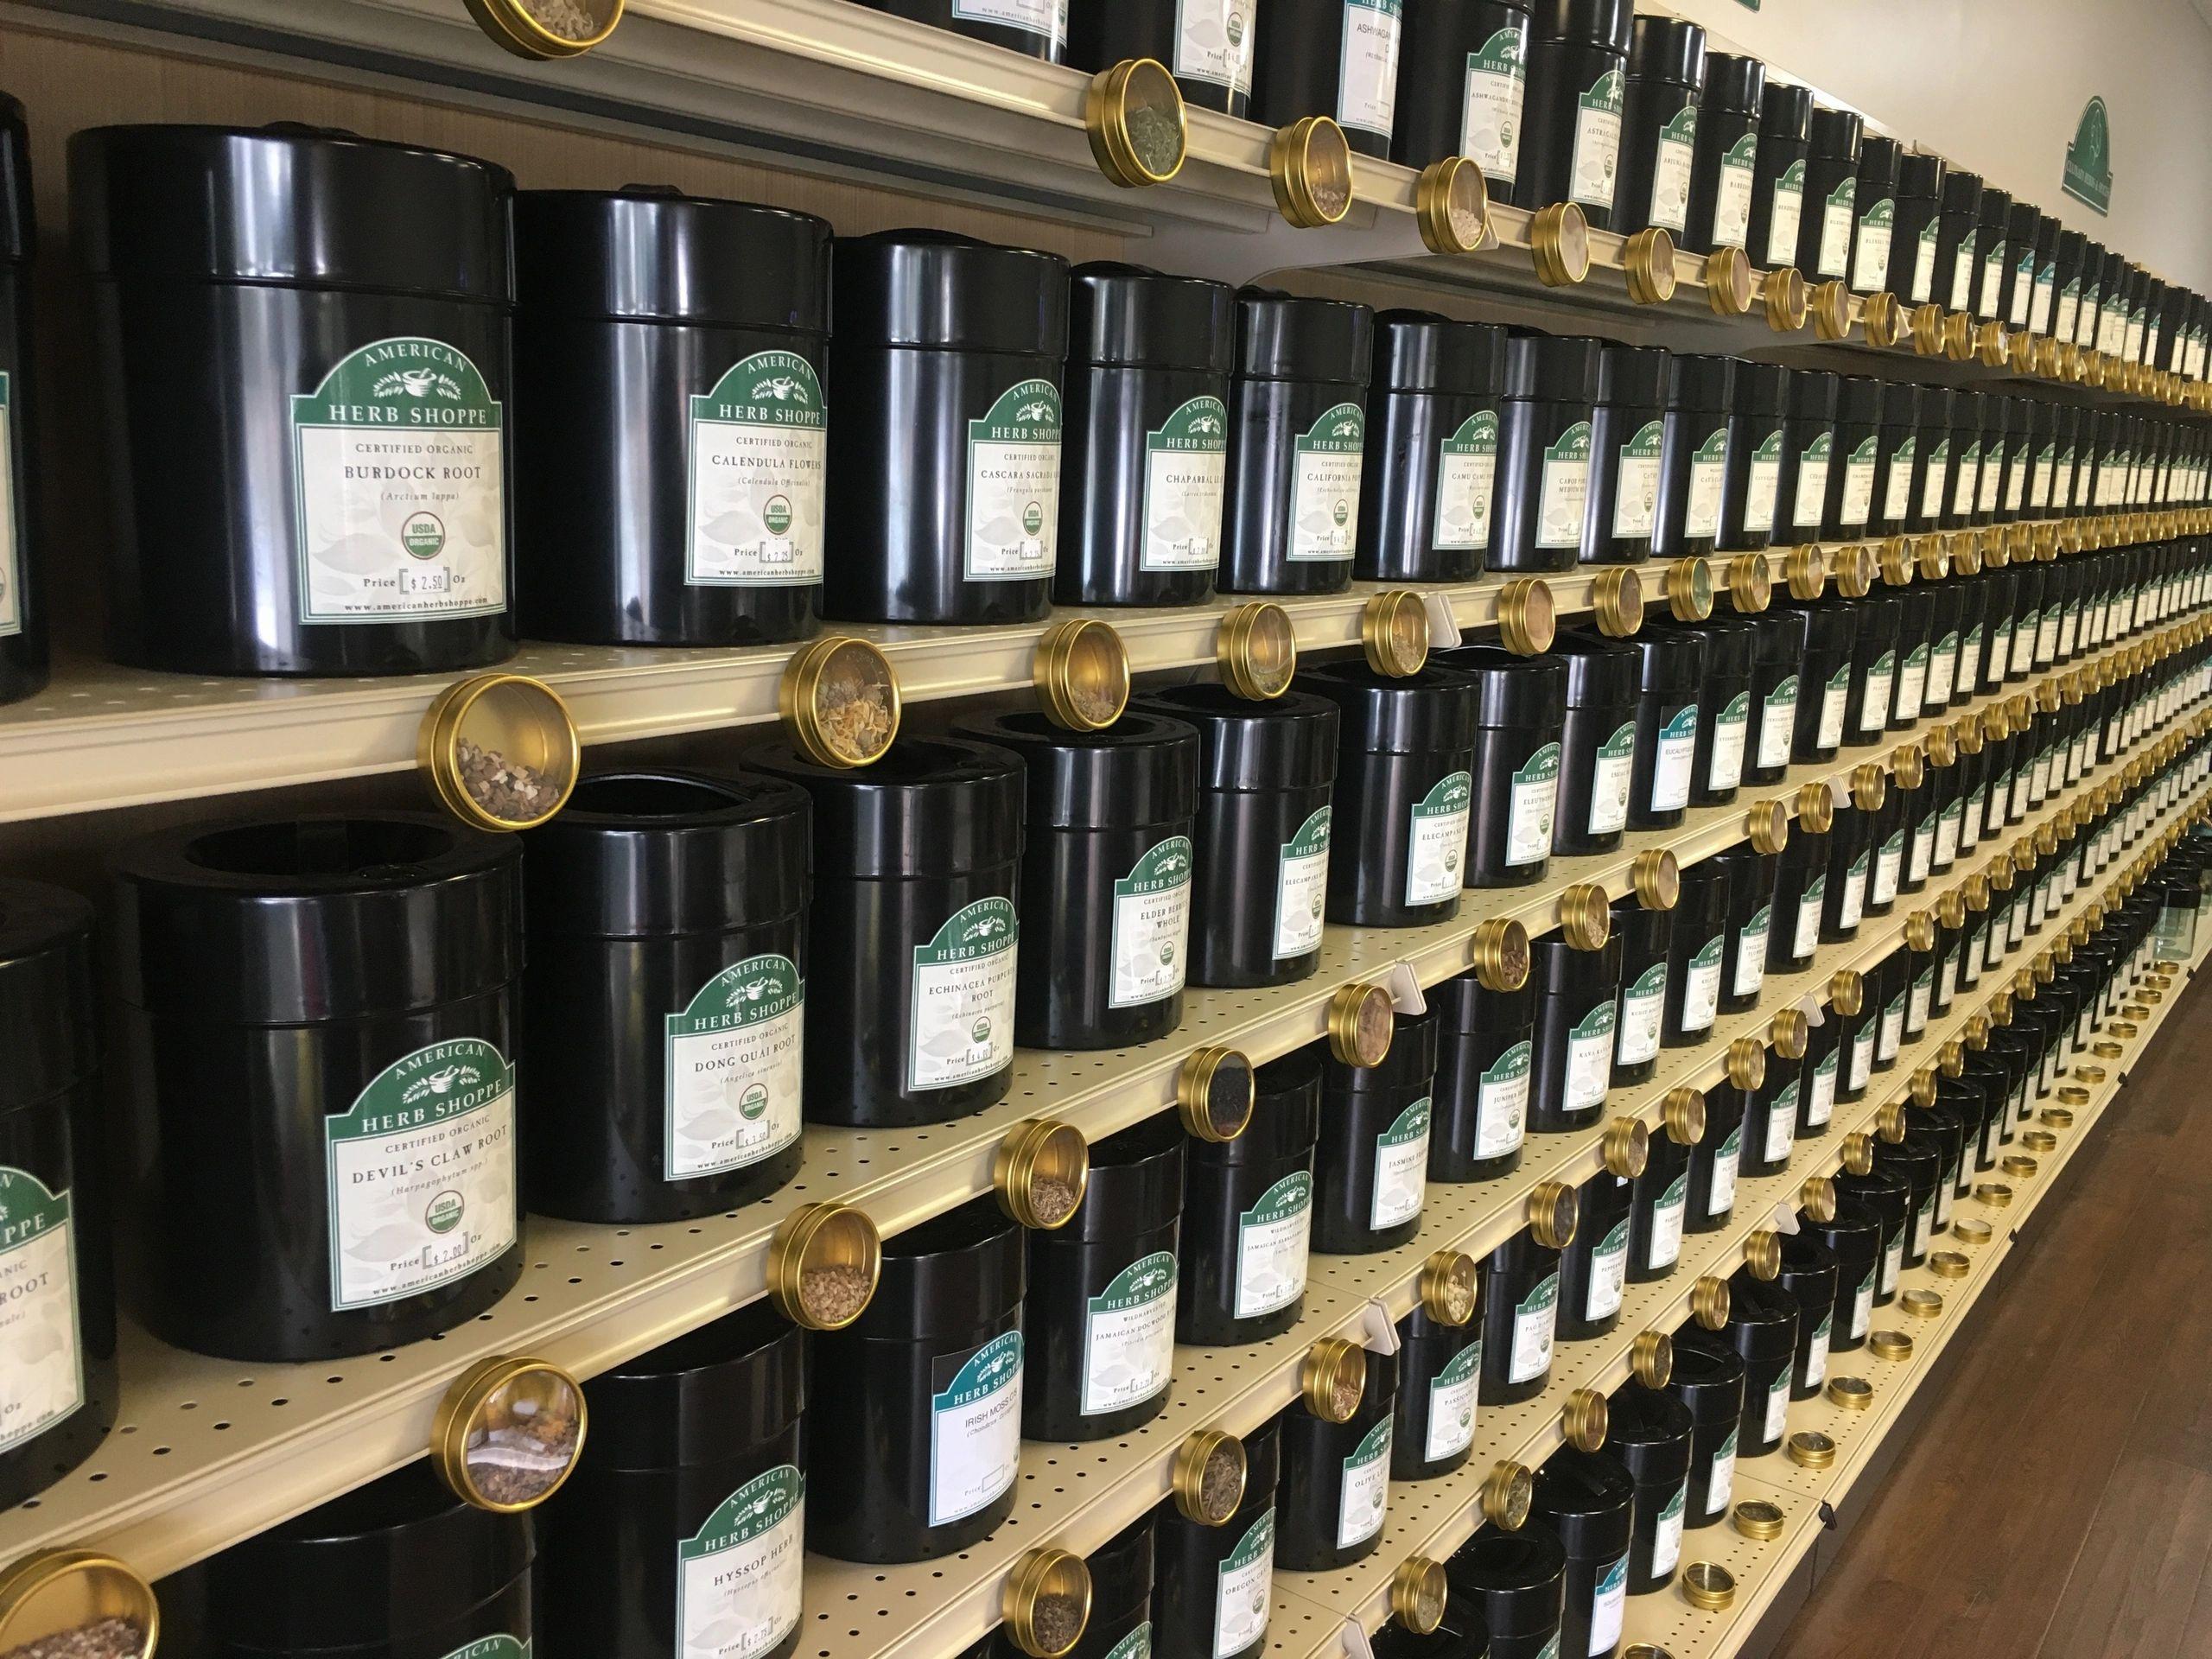 American Herb Shoppe - Herbs, Alternative Medicine